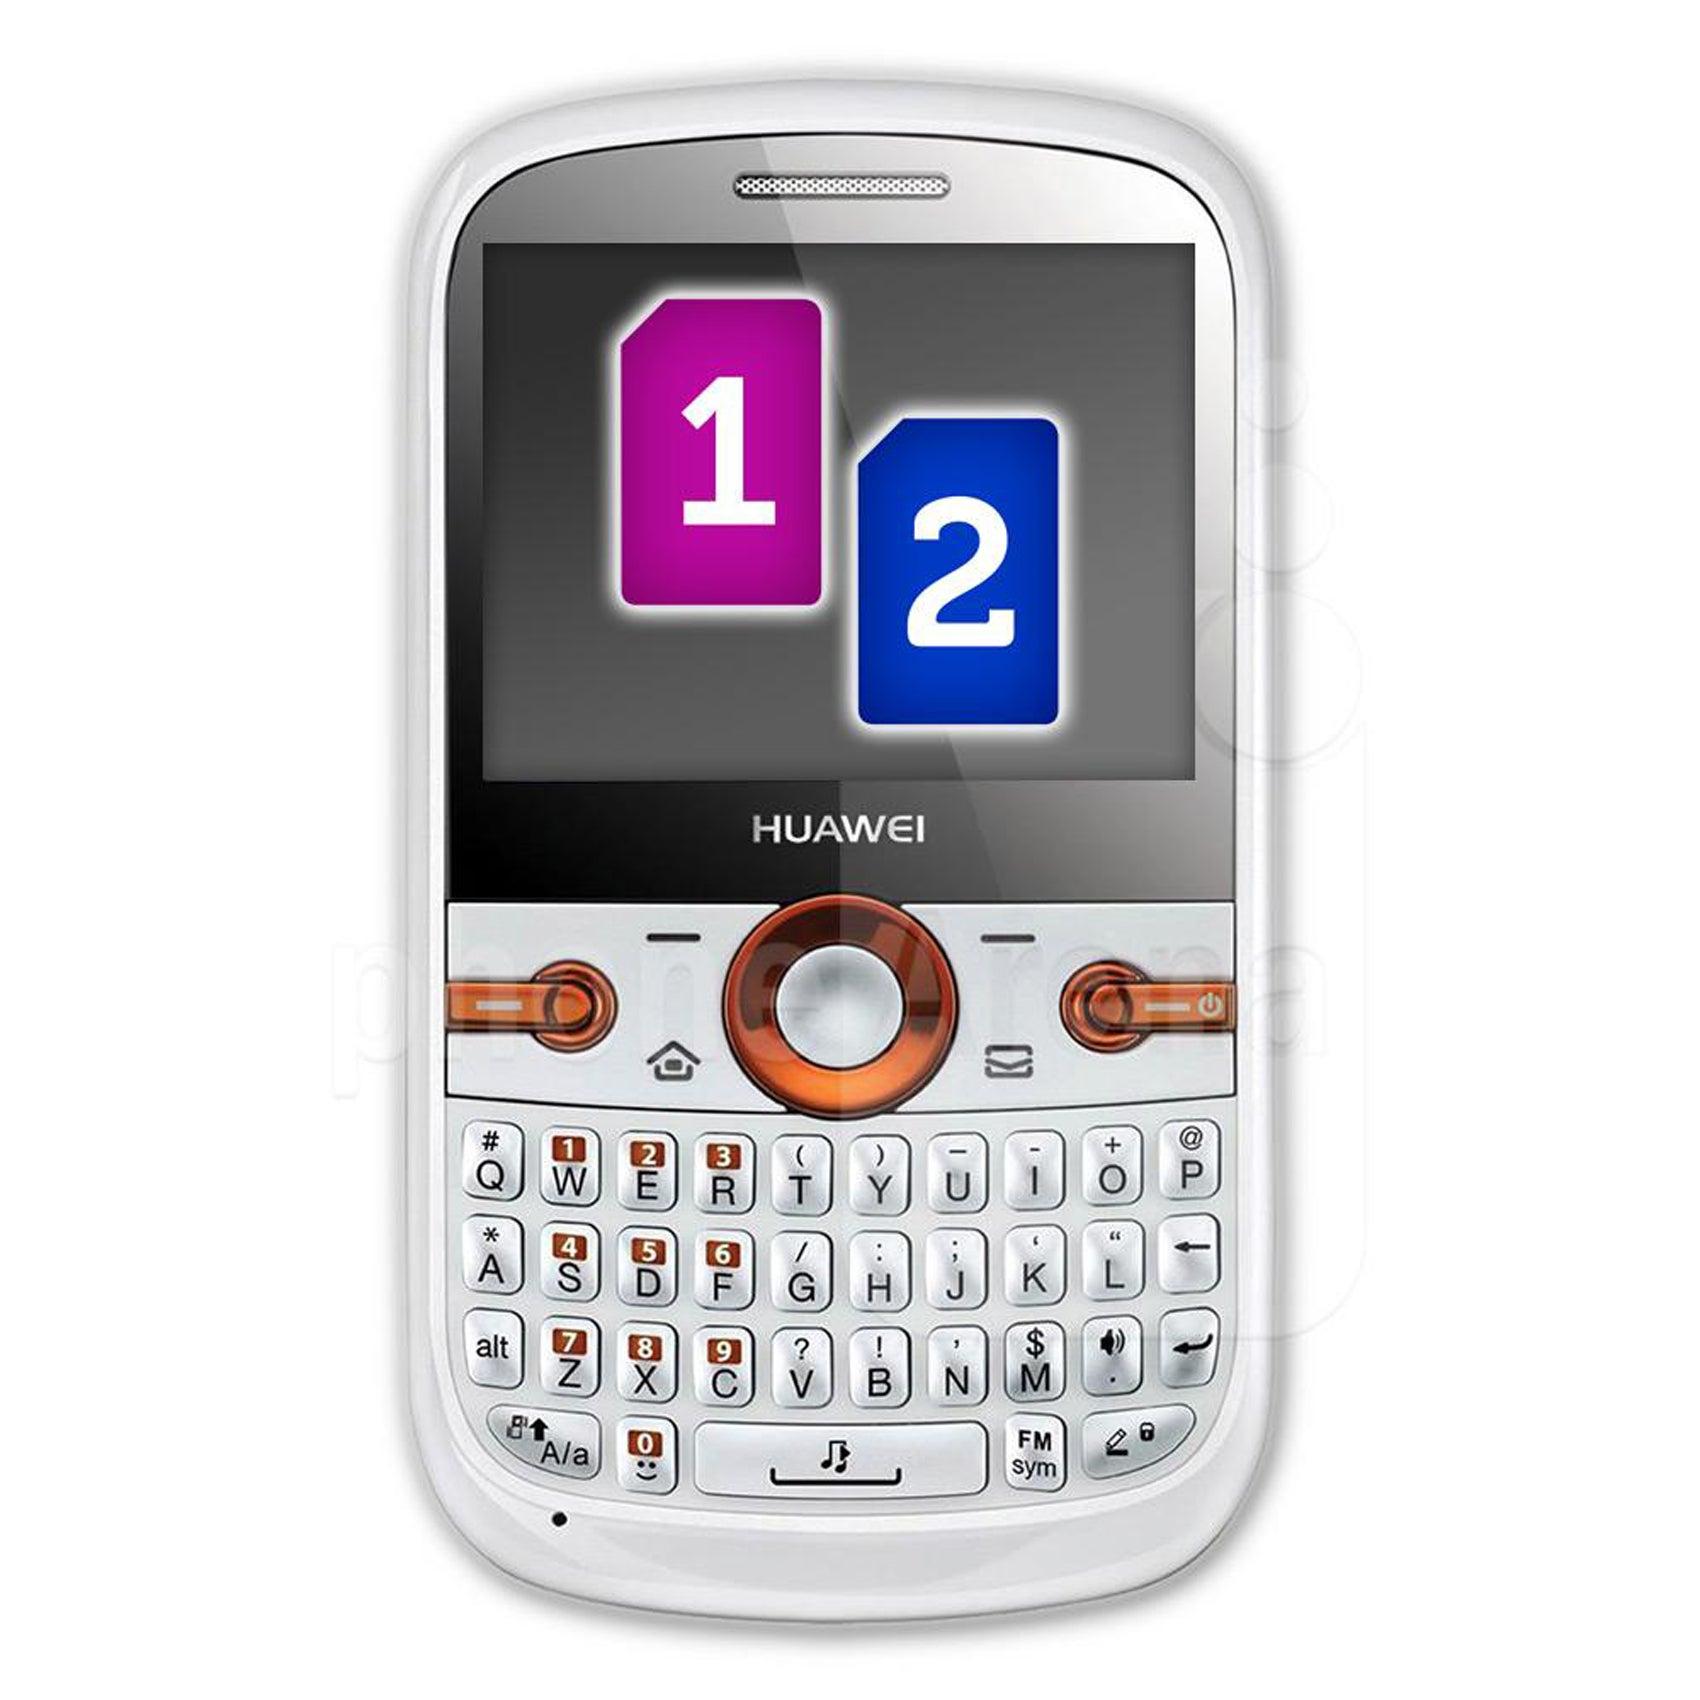 HUAWEI G6620 GSM Unlocked Dual SIM Cell Phone